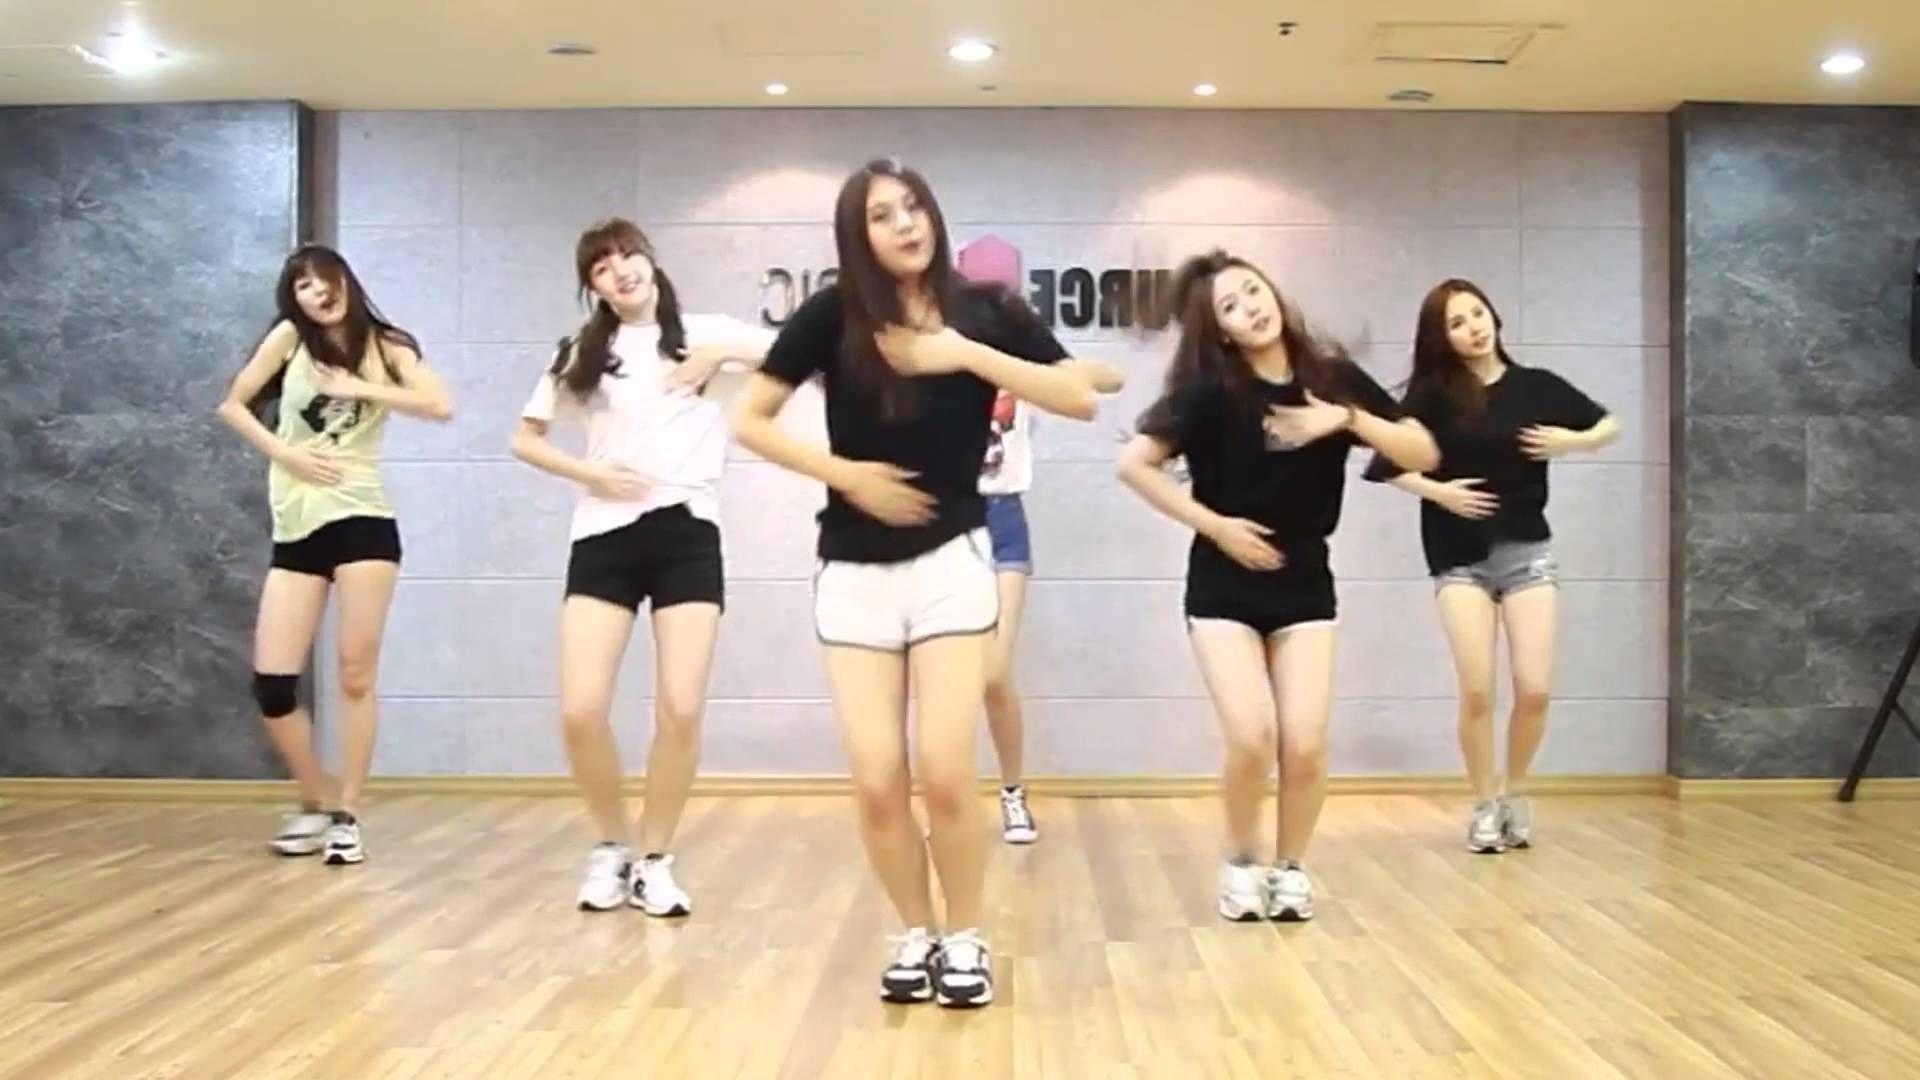 GFRIEND - Me gustas tu - mirrored dance practice video